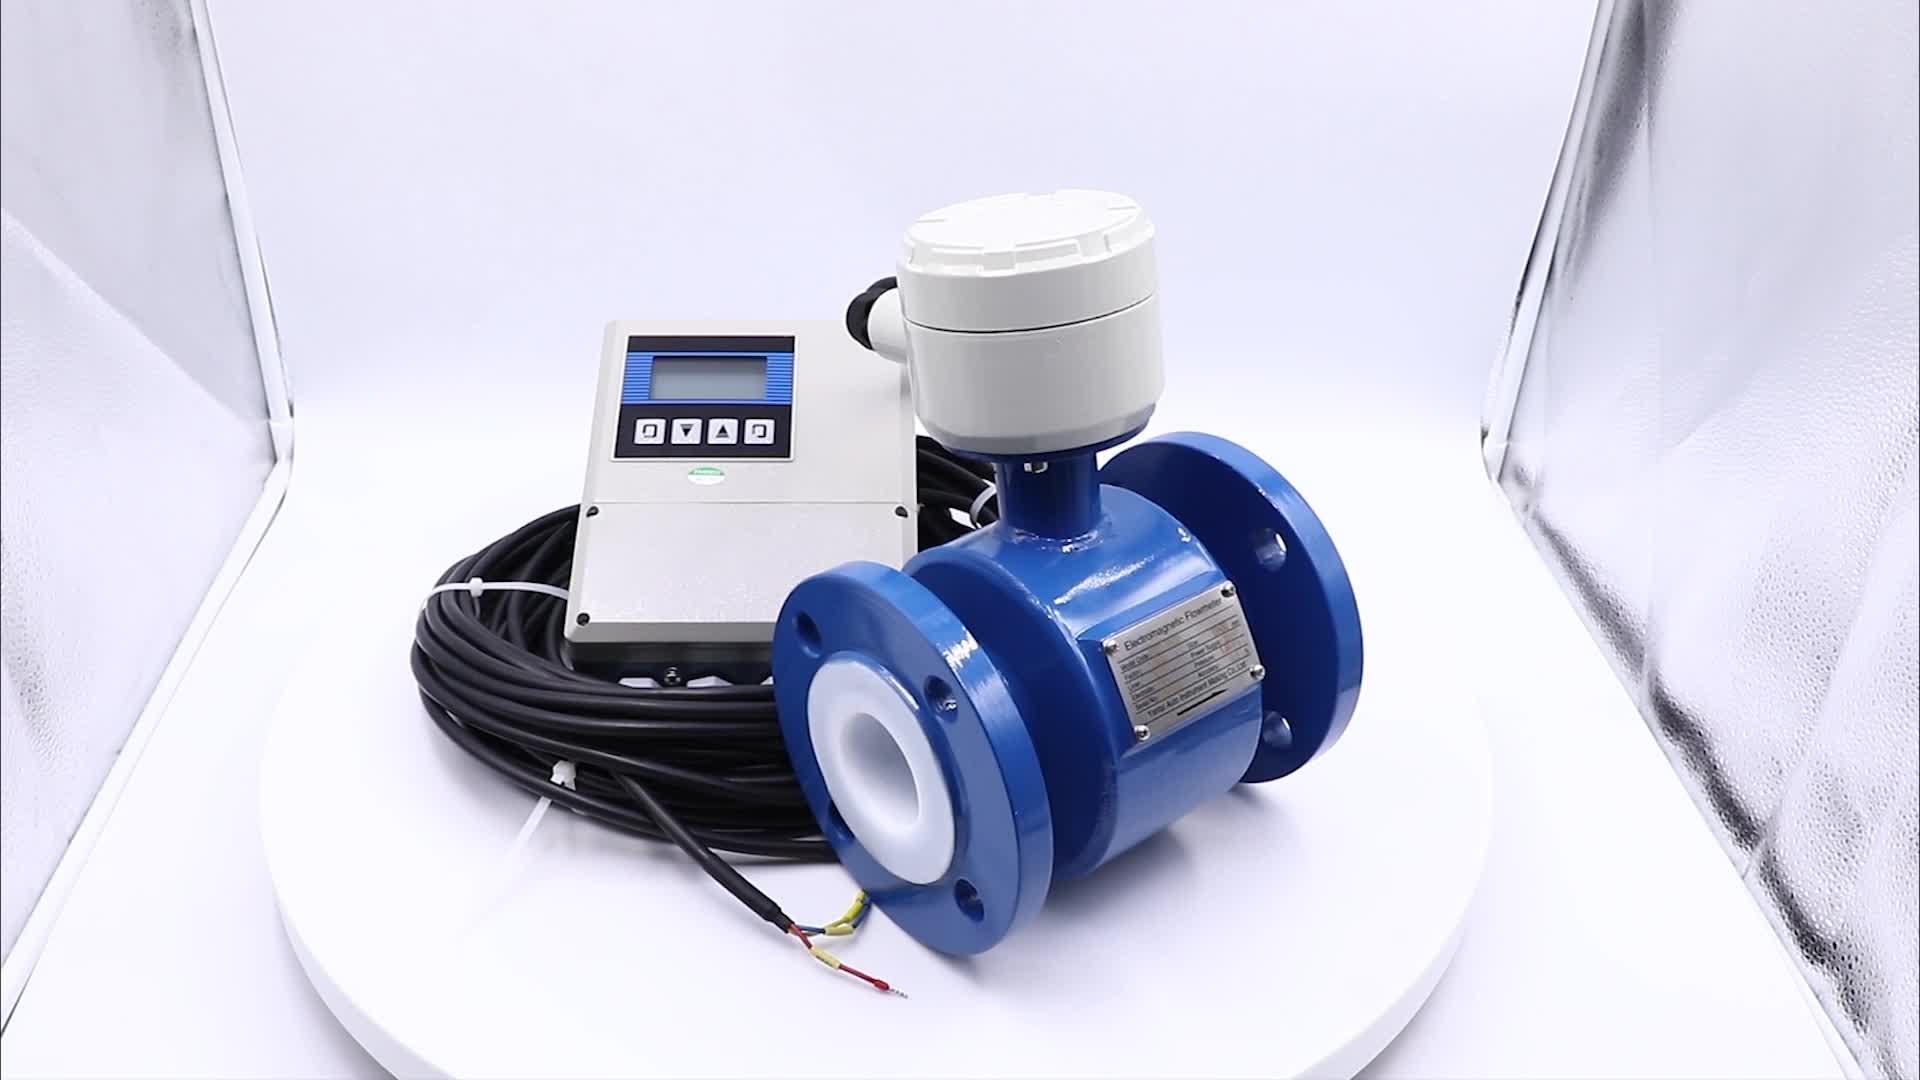 Remote Display dn150 Electromagnetic Water Flow Meter Irrigation